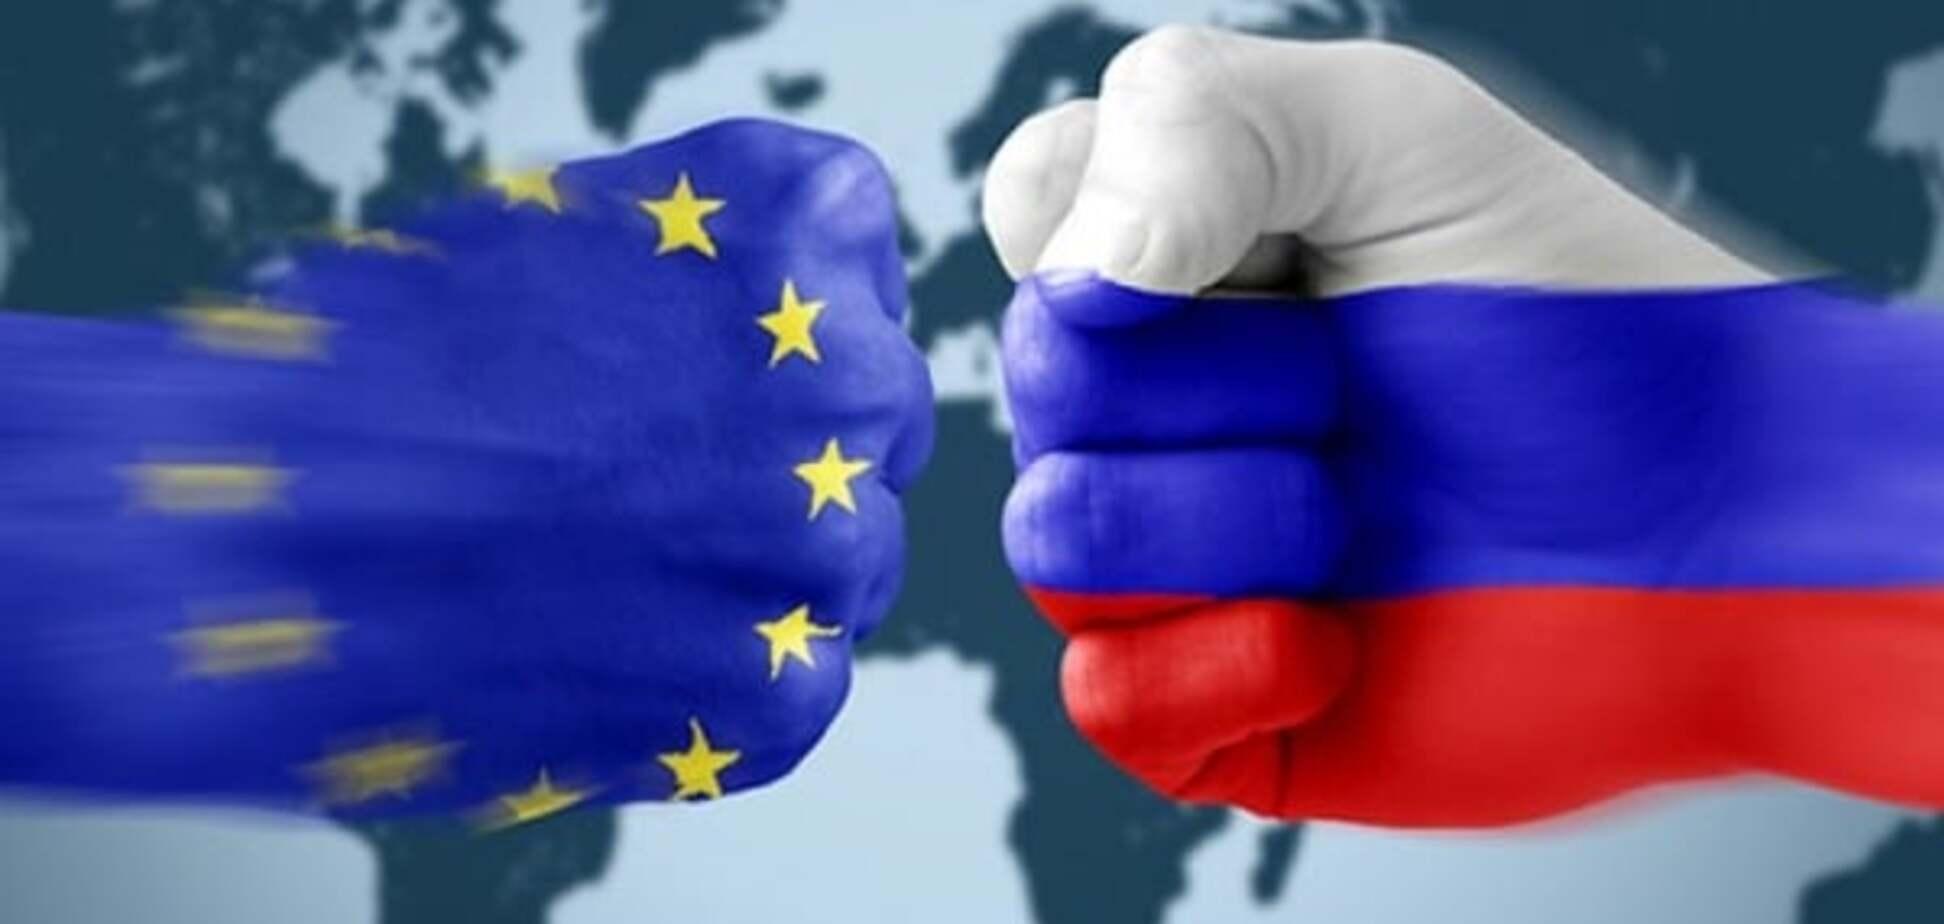 Противостояние ЕС и России